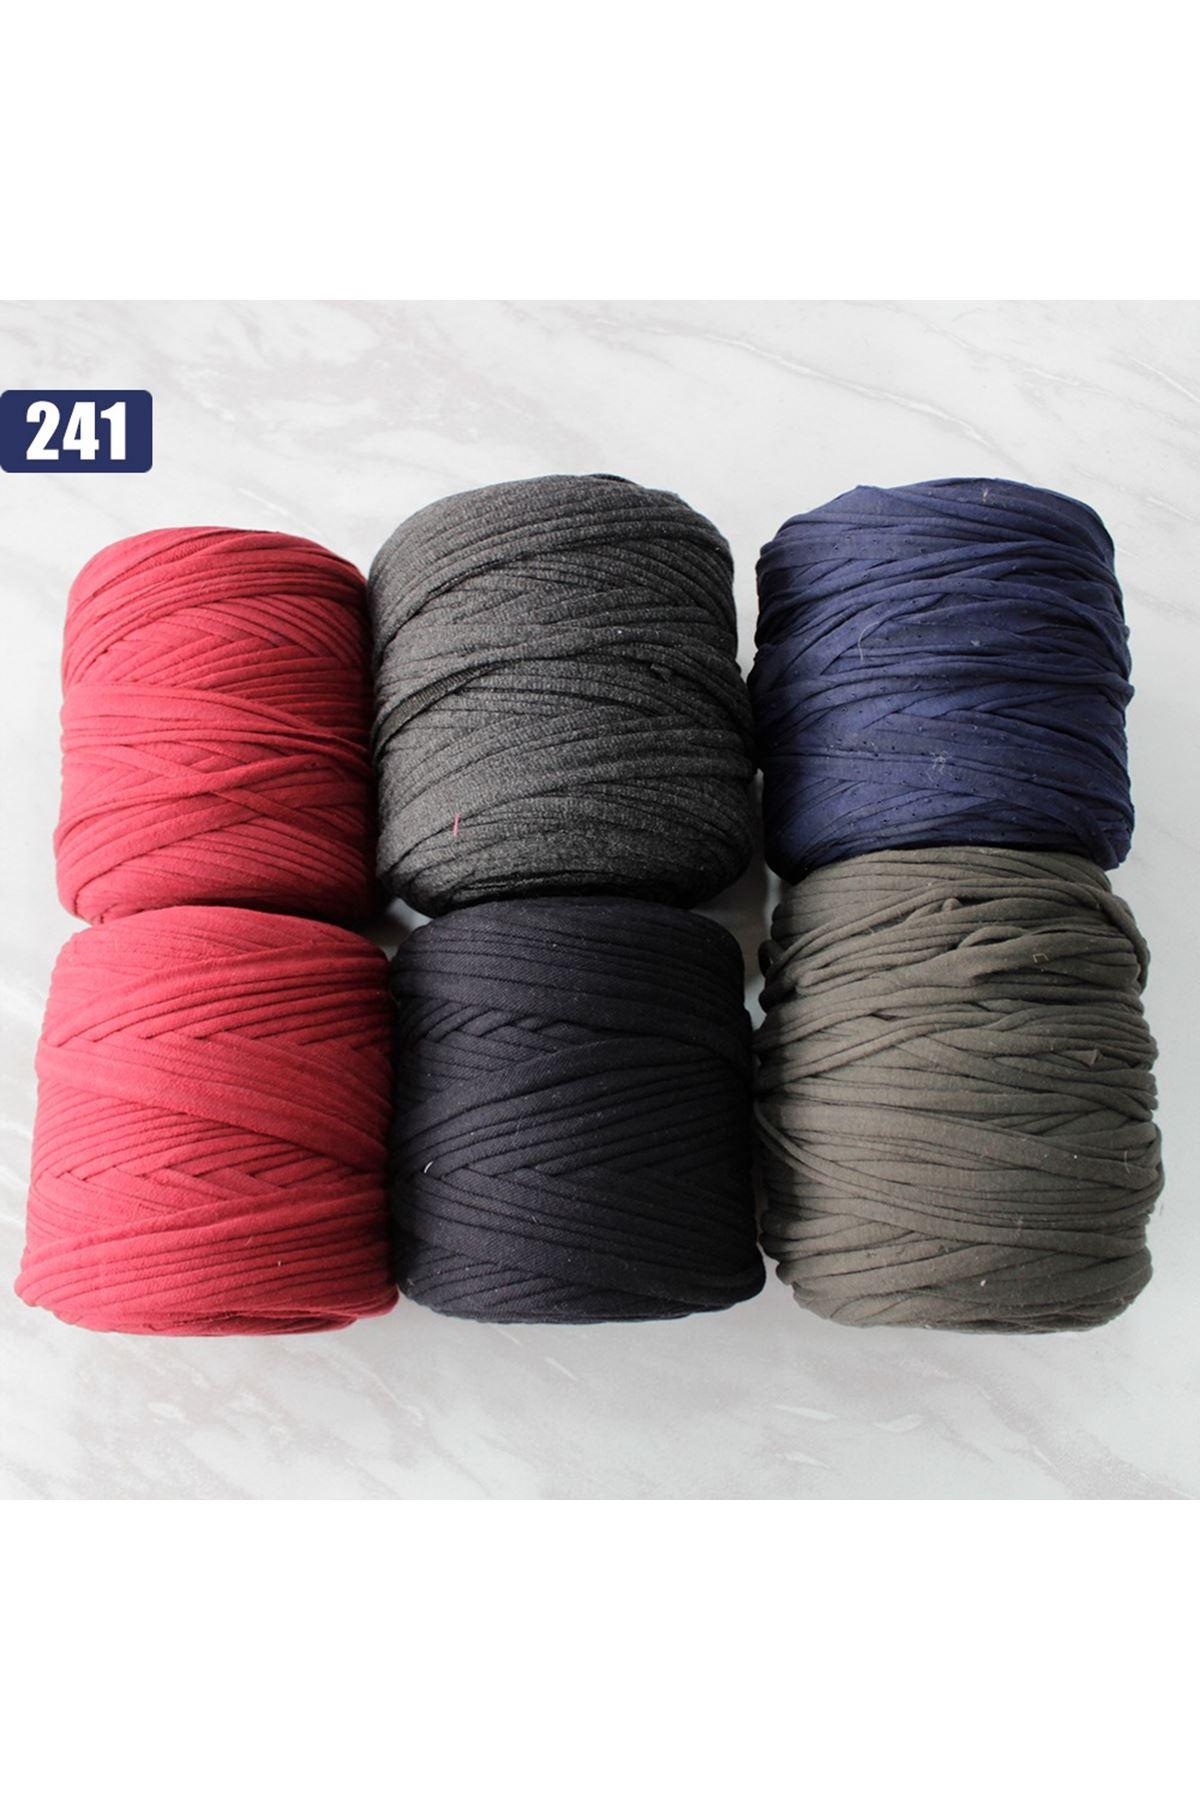 Penye 6'lı Grup 241